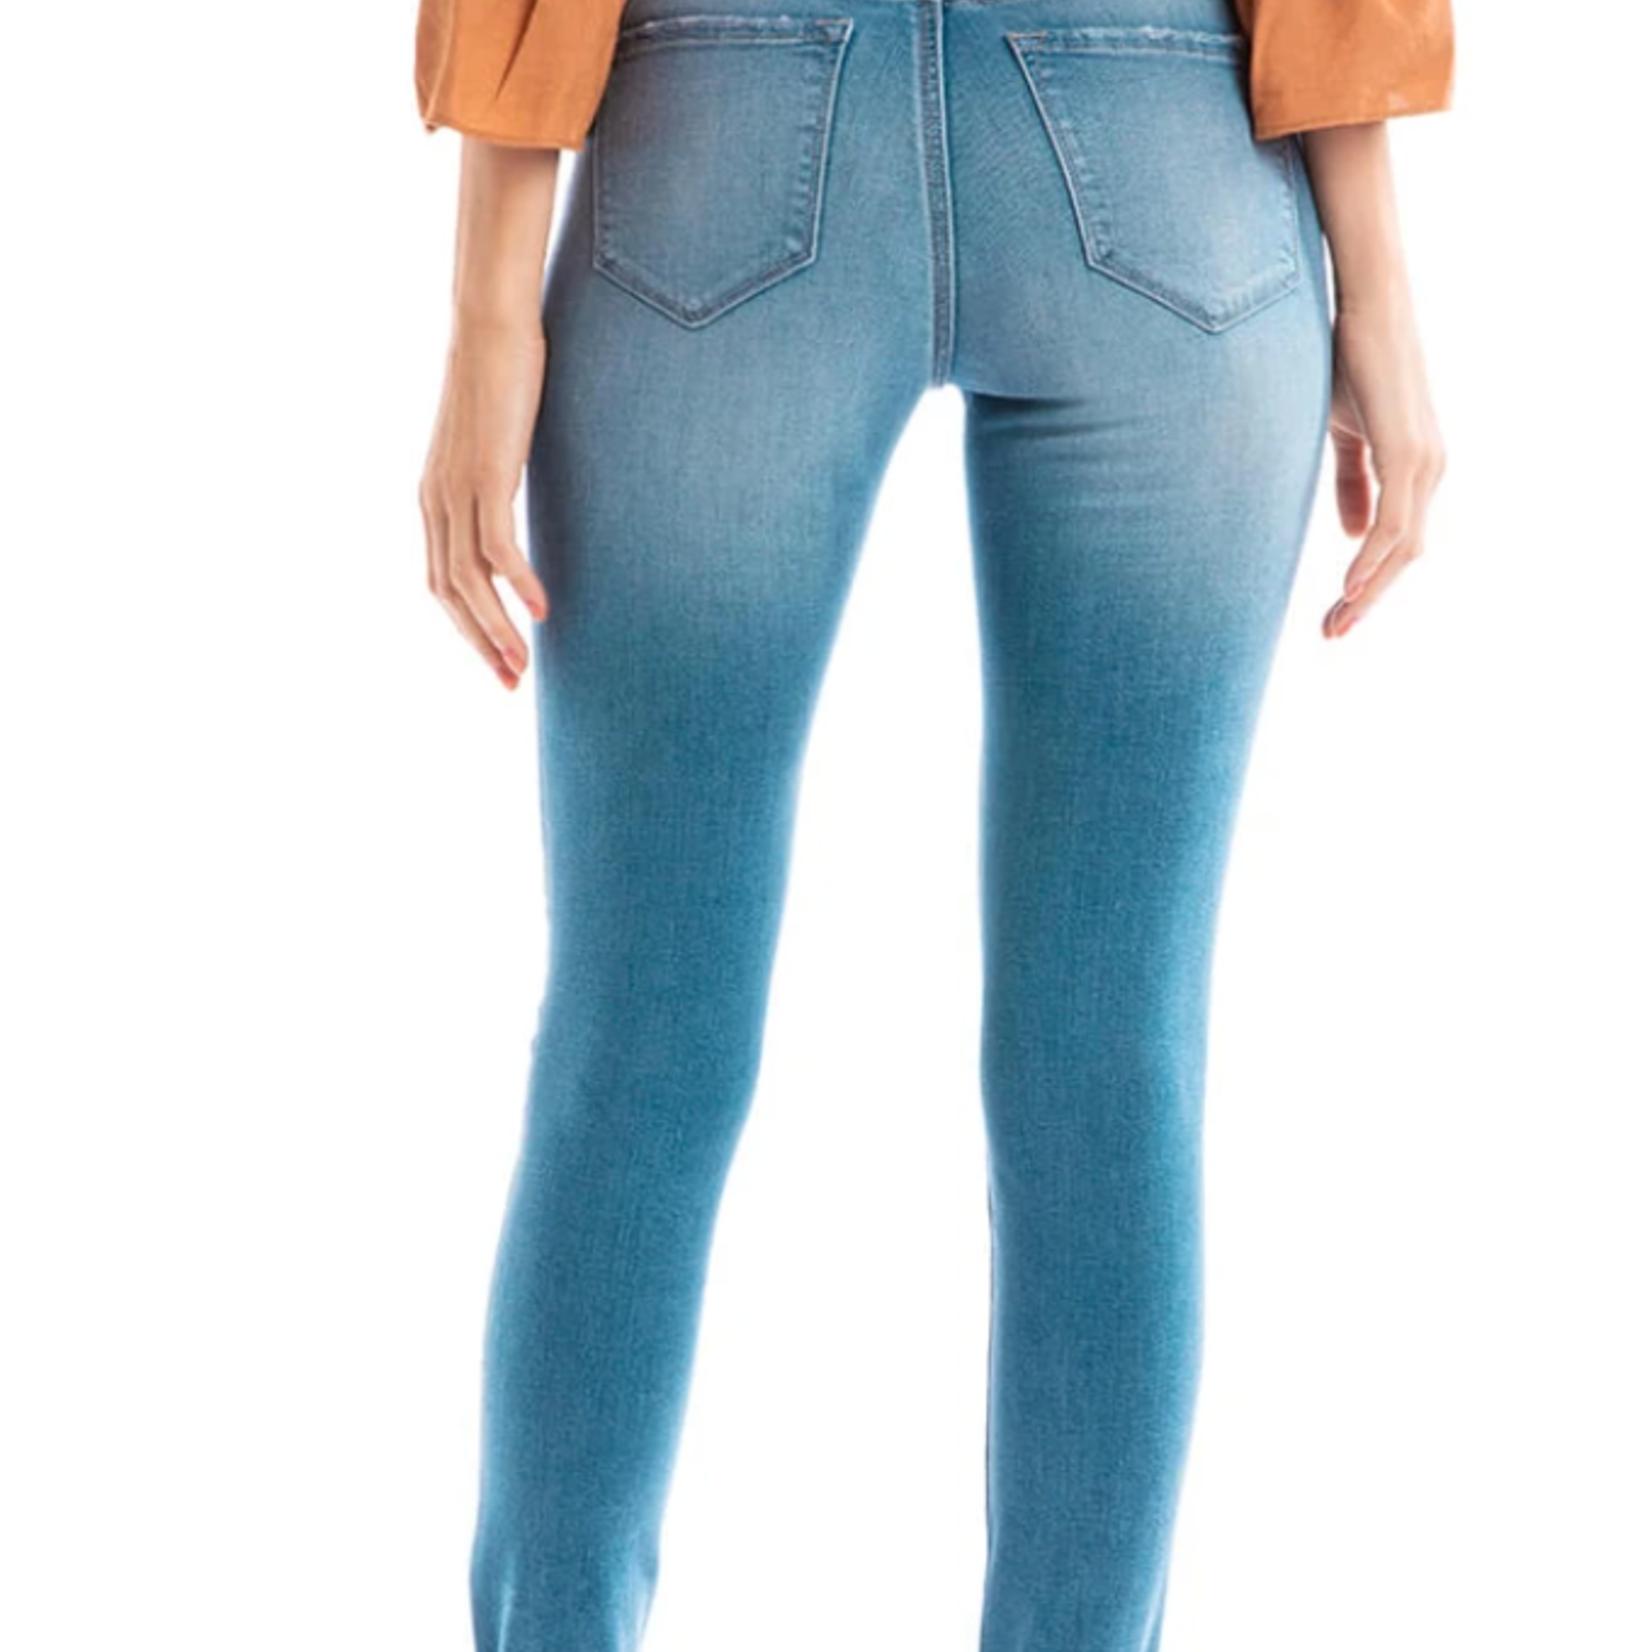 Kancan Drew High Rise Ankle Skinny Jeans KC6192M